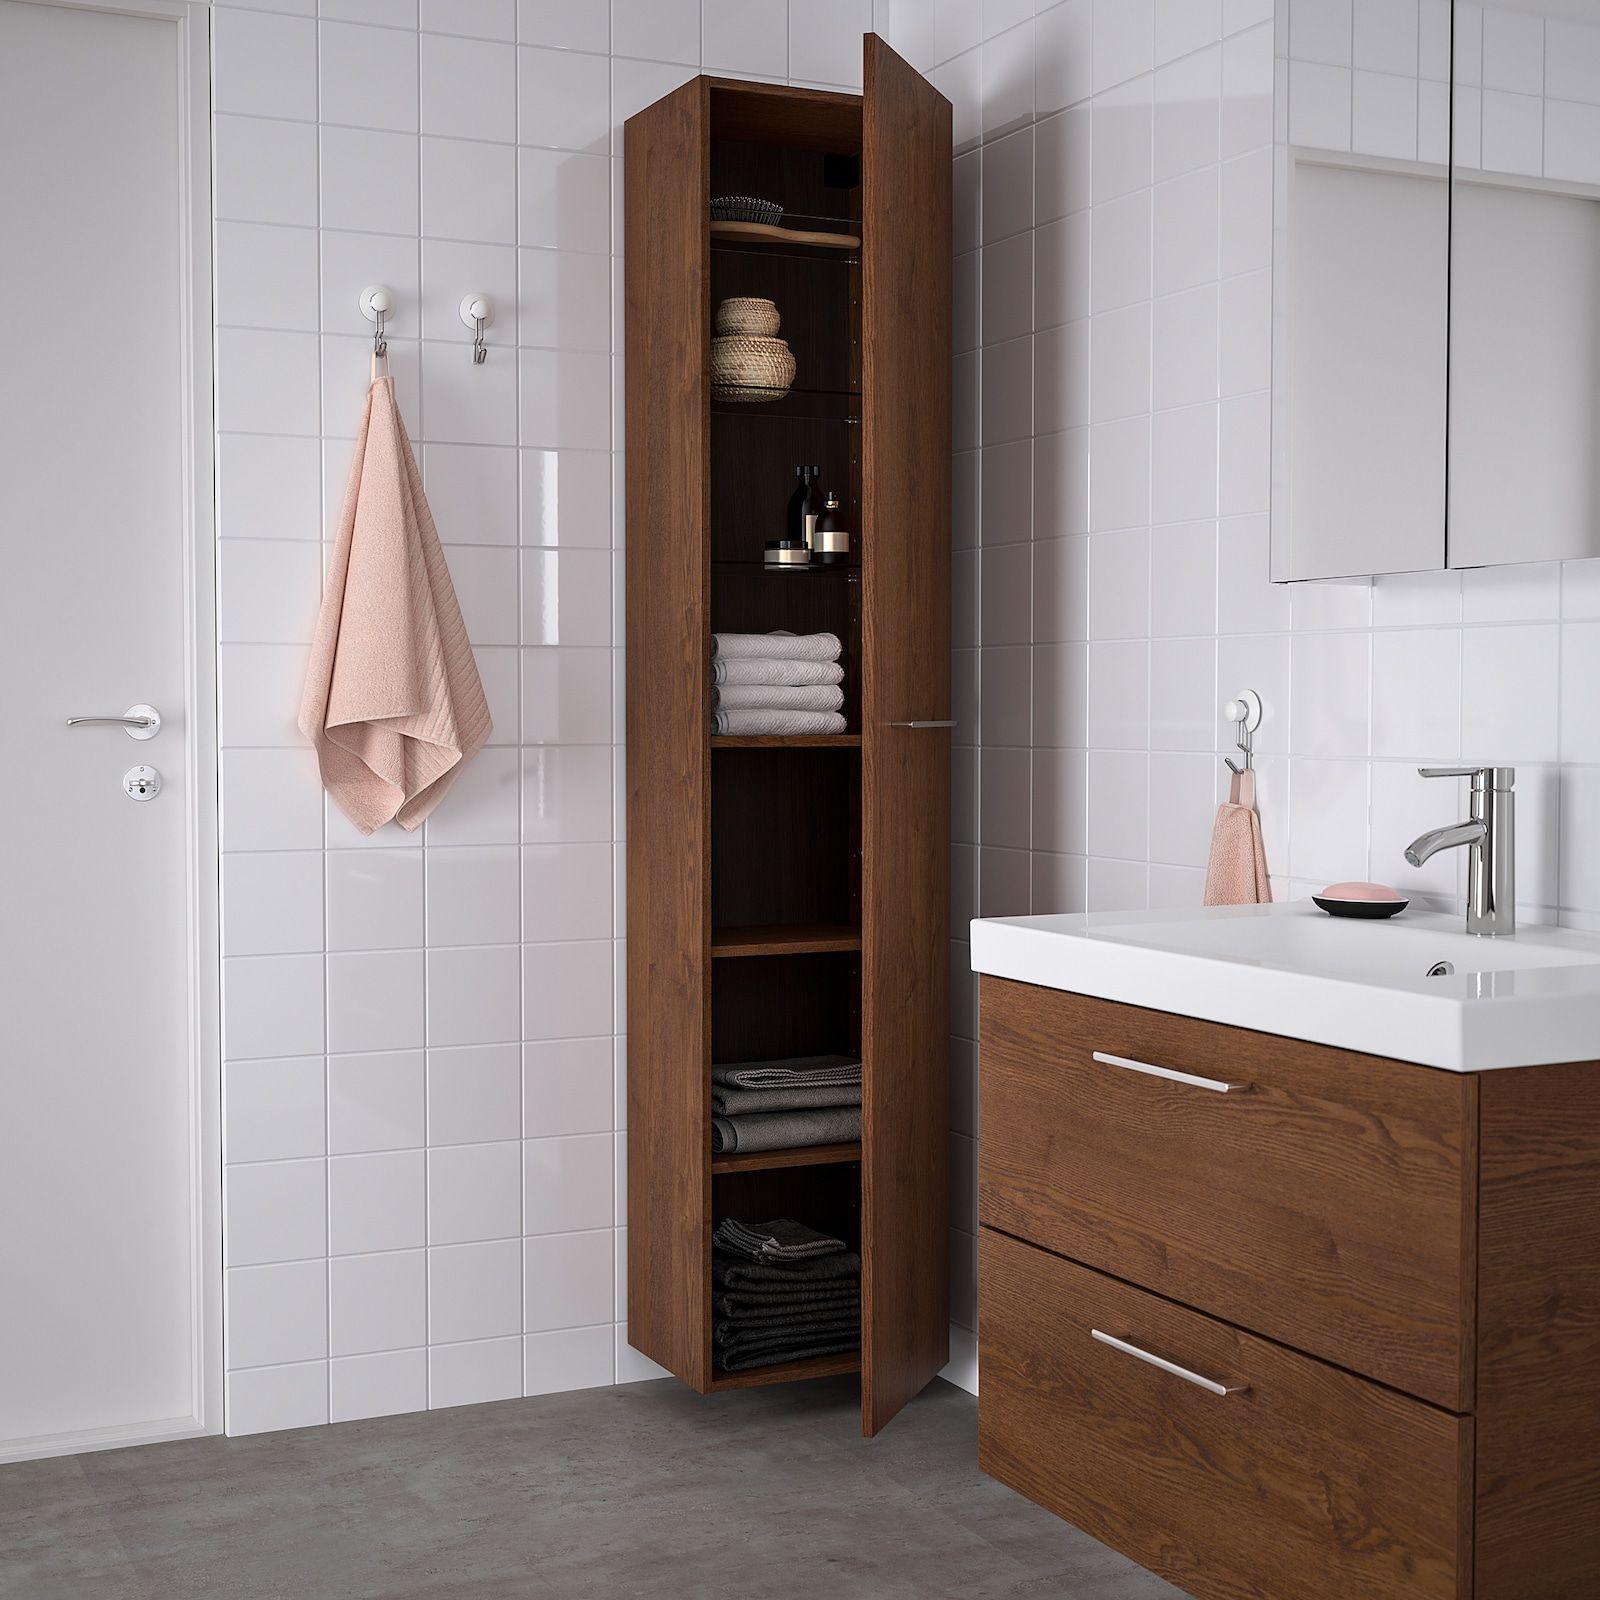 Ikea Godmorgon Braviken Gray High Gloss Gray Sink Cabinet With 2 Drawers Mirror Cabinets Ikea Godmorgon Ikea